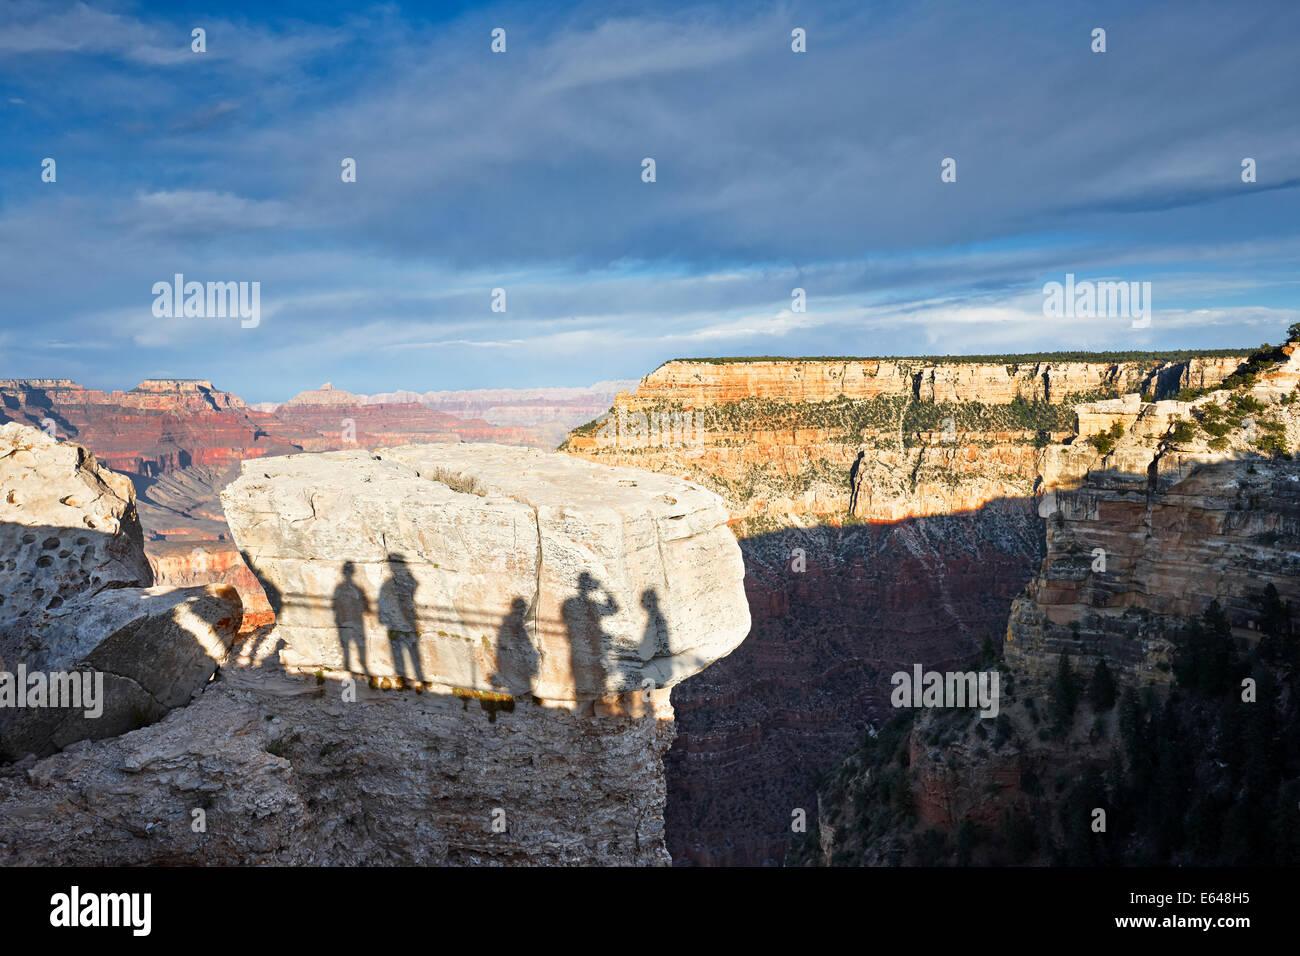 Shadows of people watching sunset at Grand Canyon South Rim. Arizona, USA. - Stock Image